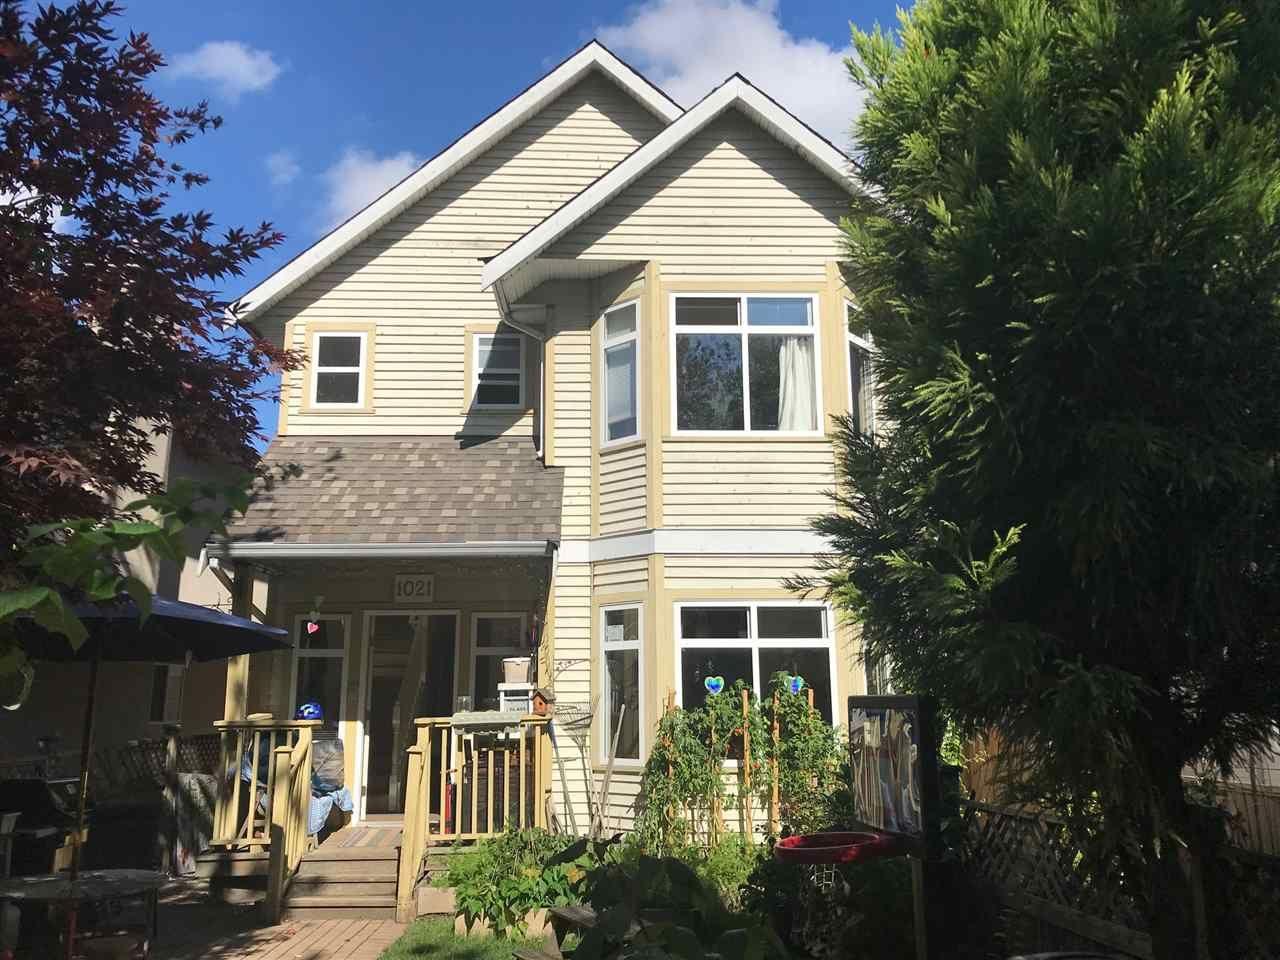 Main Photo: 1021 E 15TH Avenue in Vancouver: Mount Pleasant VE 1/2 Duplex for sale (Vancouver East)  : MLS®# R2501860